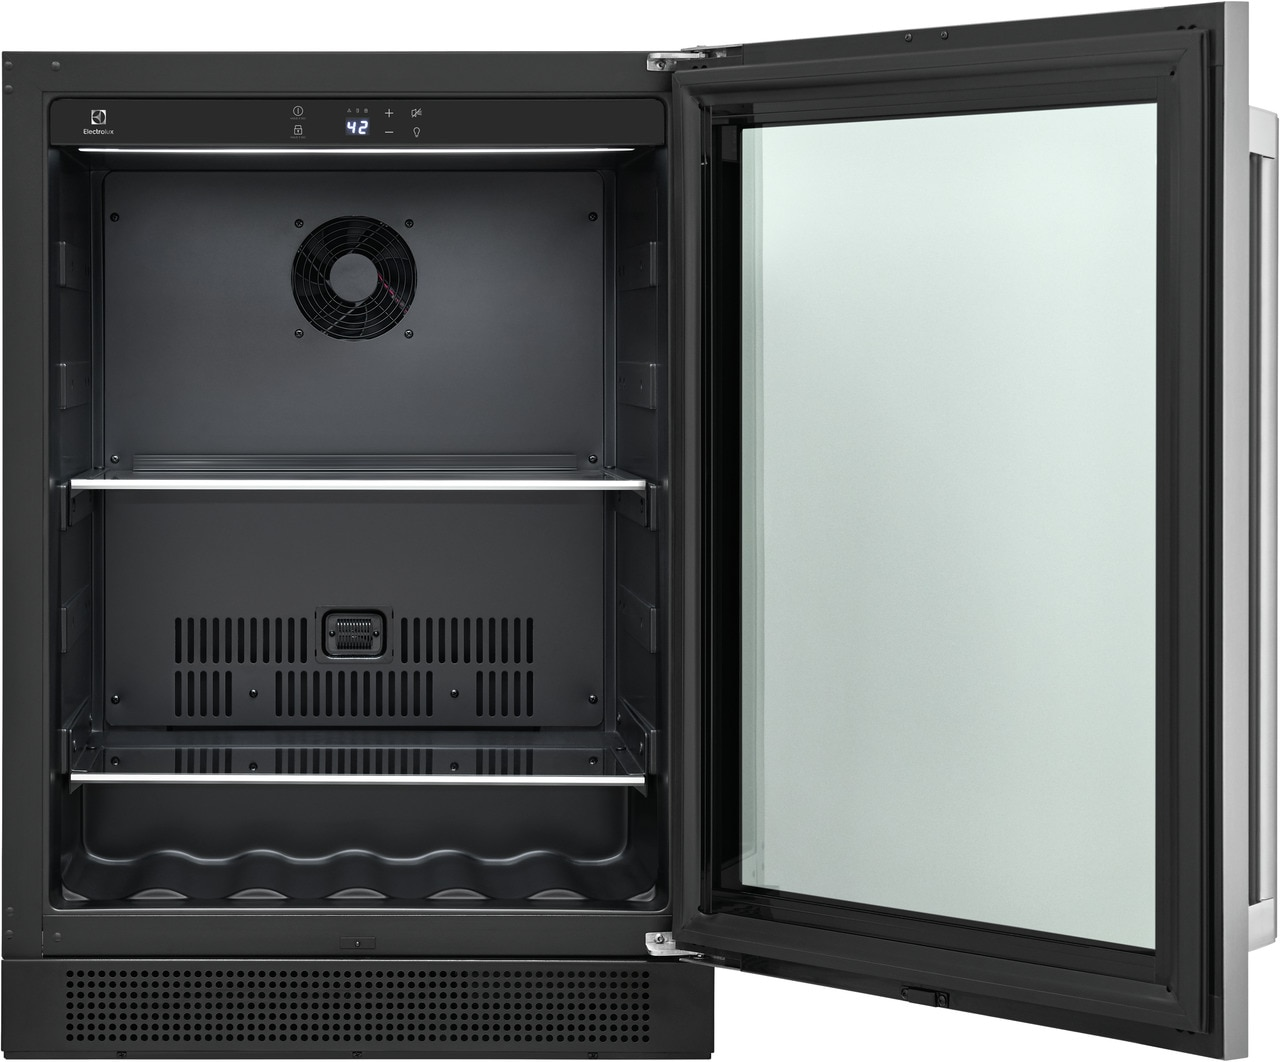 Model: EI24BC15VS | Electrolux 5.1 Cu. Ft. Under-Counter Beverage Center